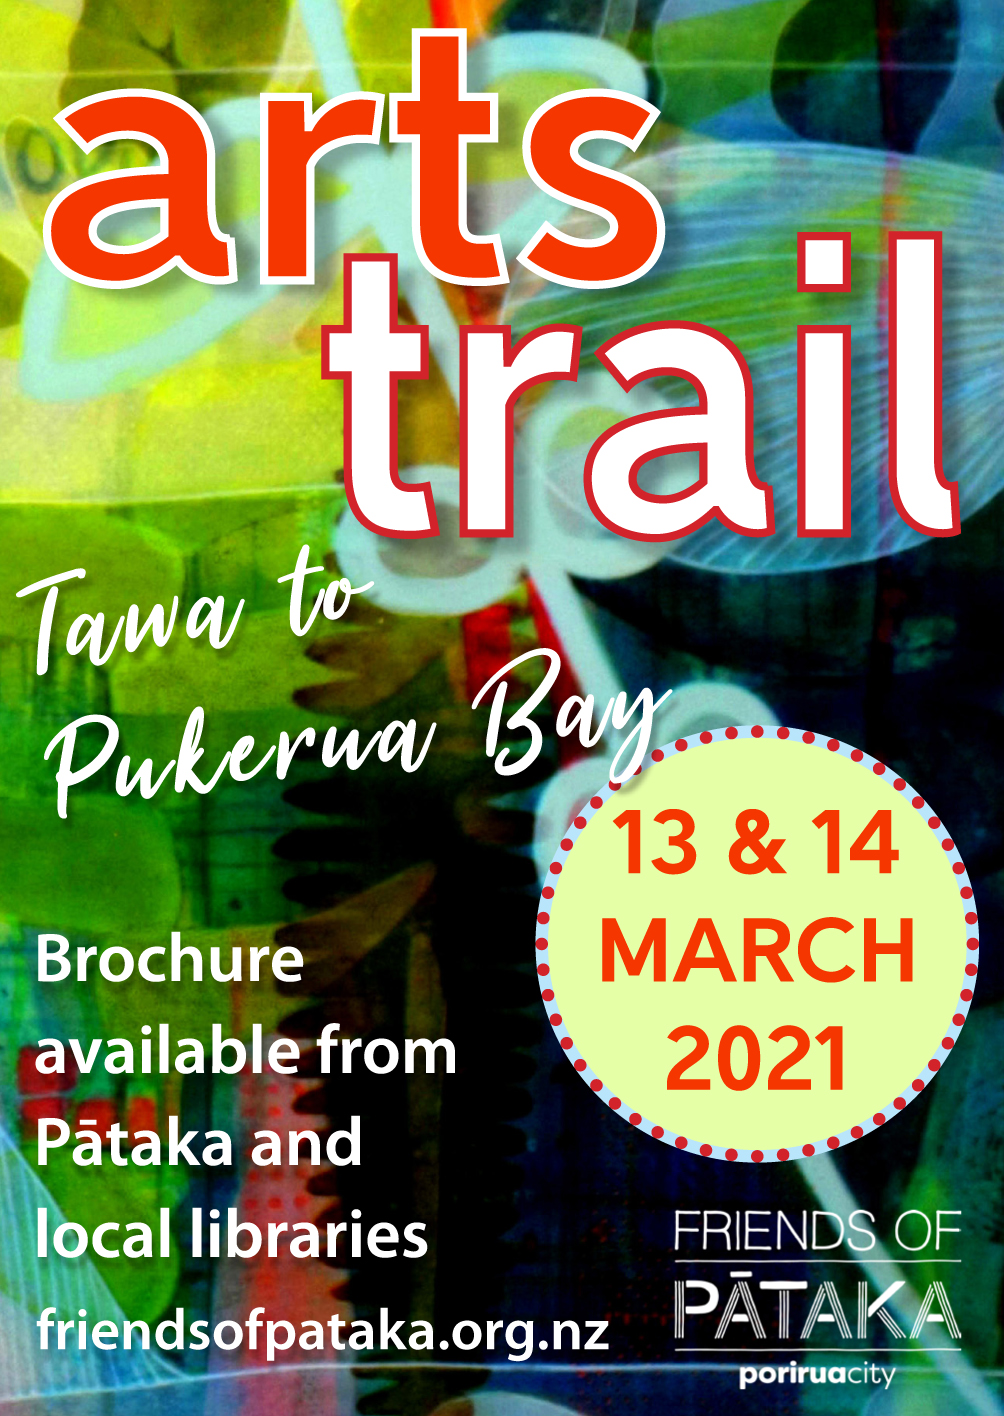 Friends of Pataka ArtsTrail2021_85x120_CapitalMag